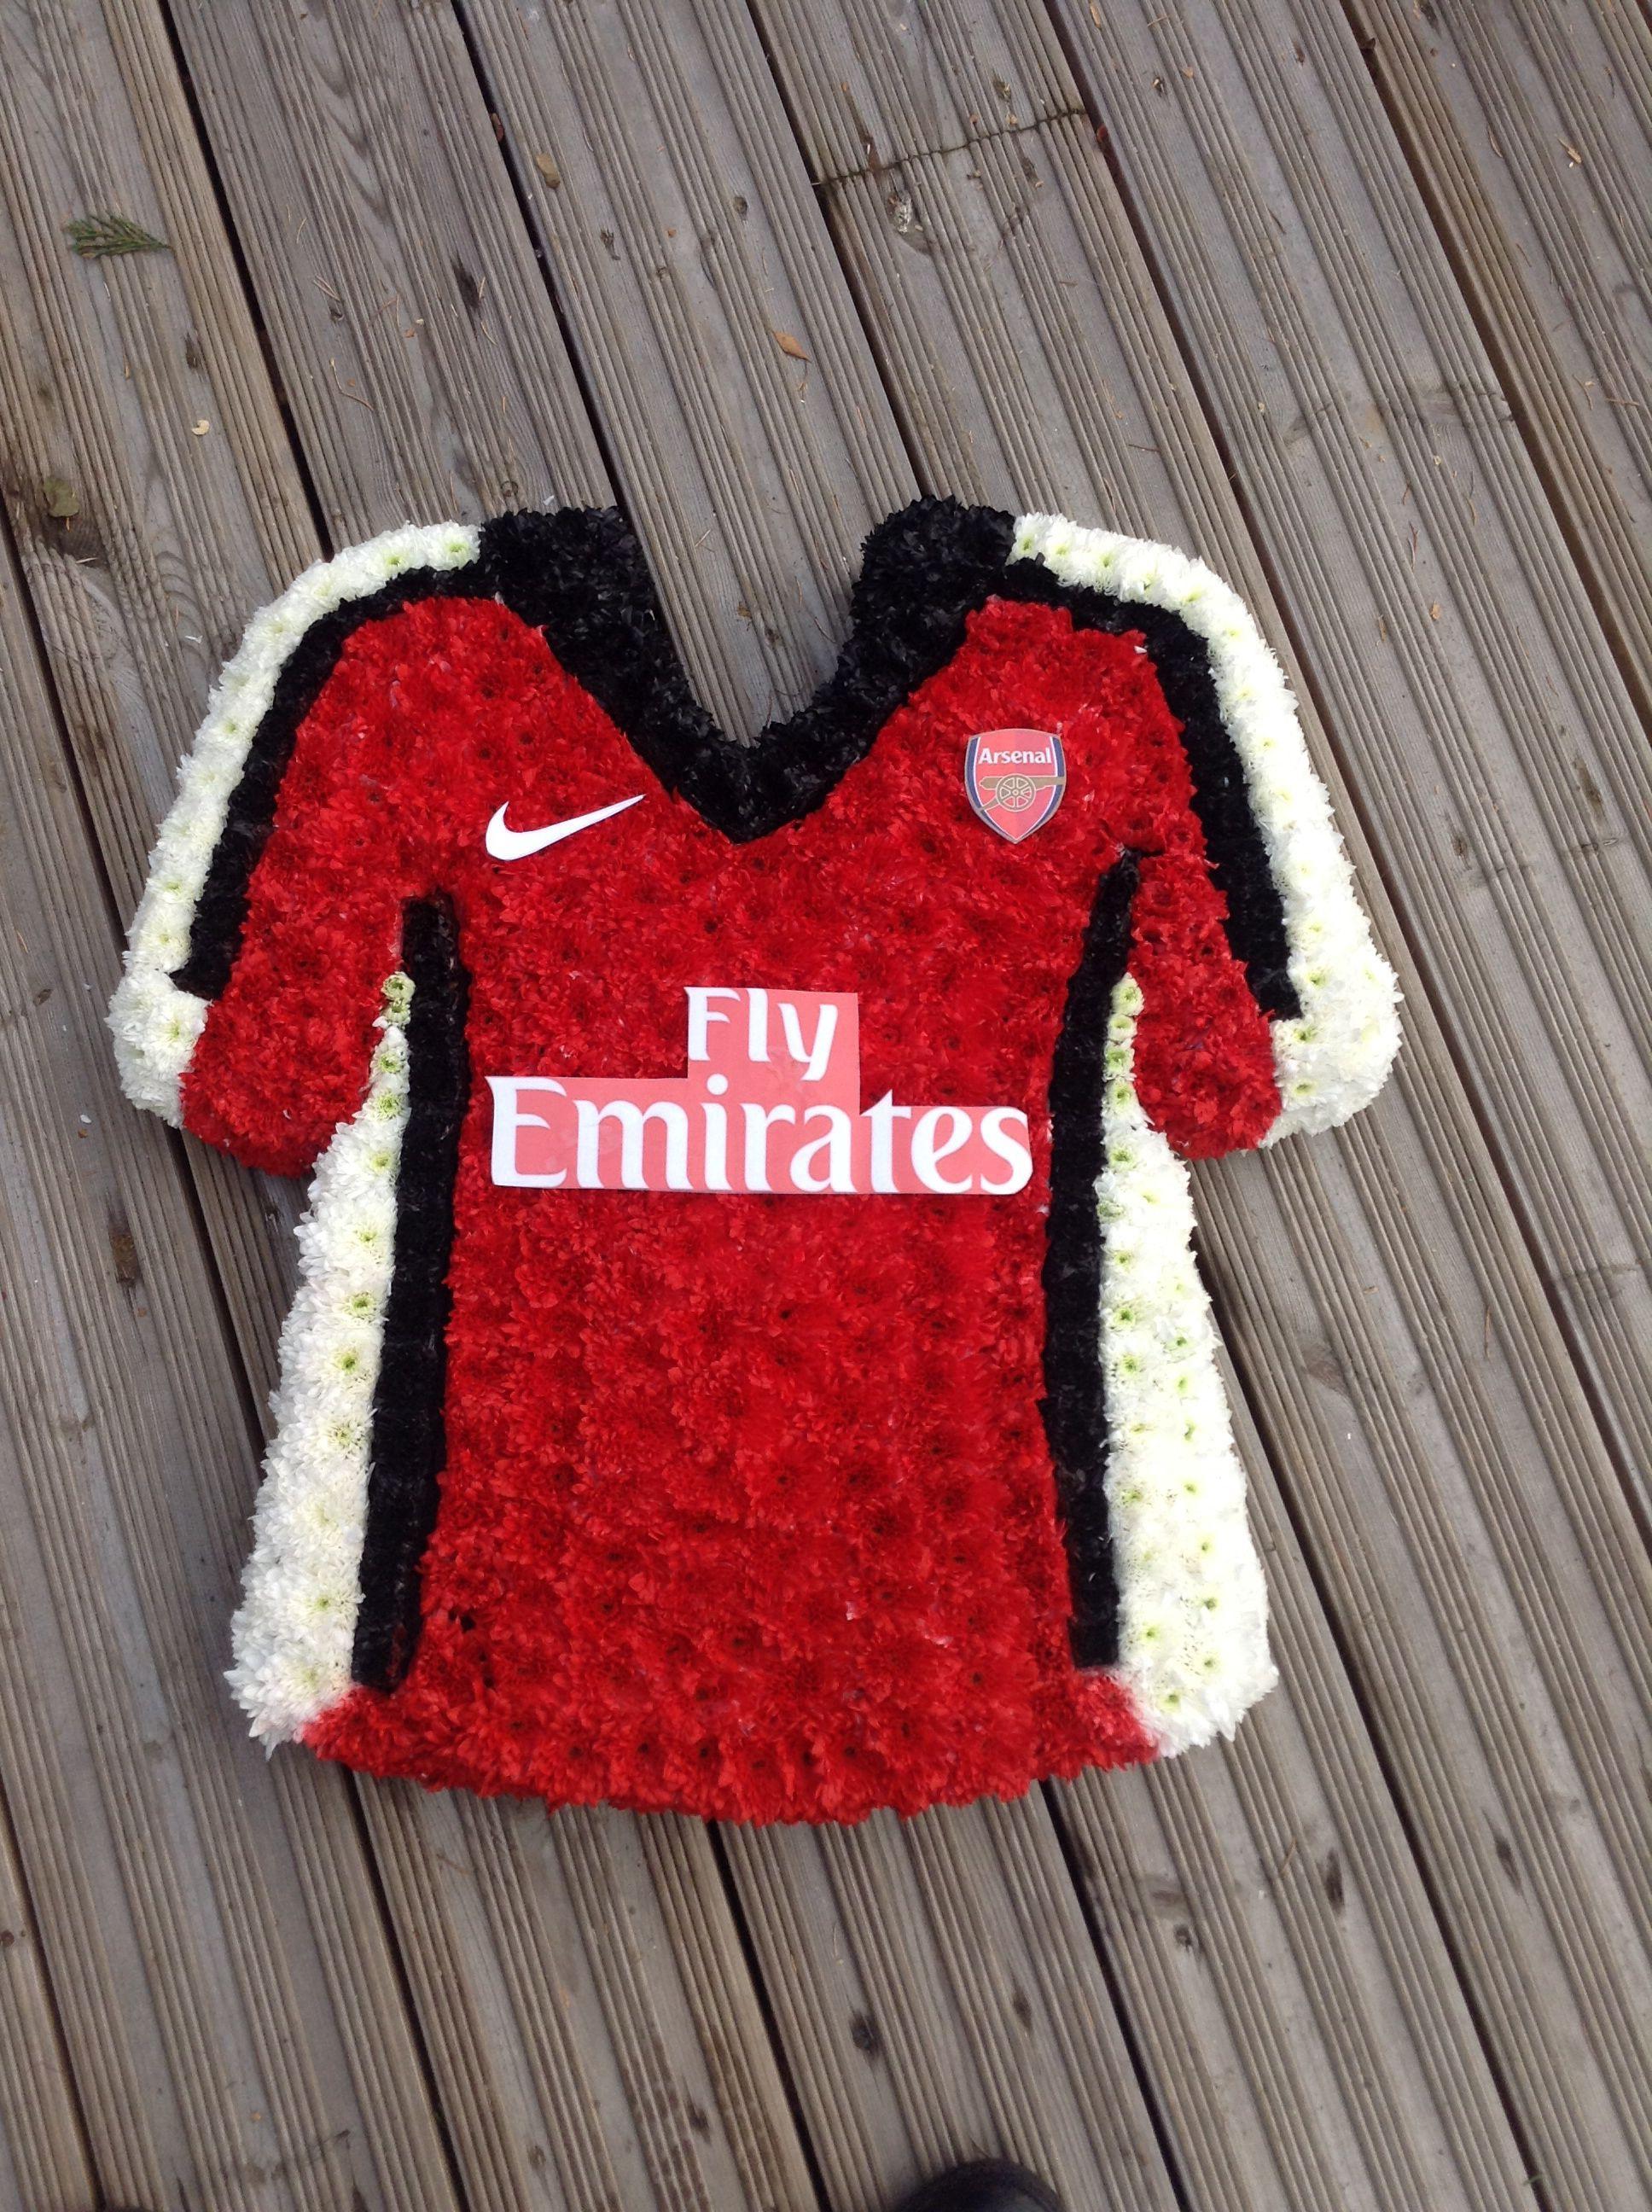 Arsenal football shirt funeral tribute thefloralartstudio arsenal football shirt funeral tribute thefloralartstudio izmirmasajfo